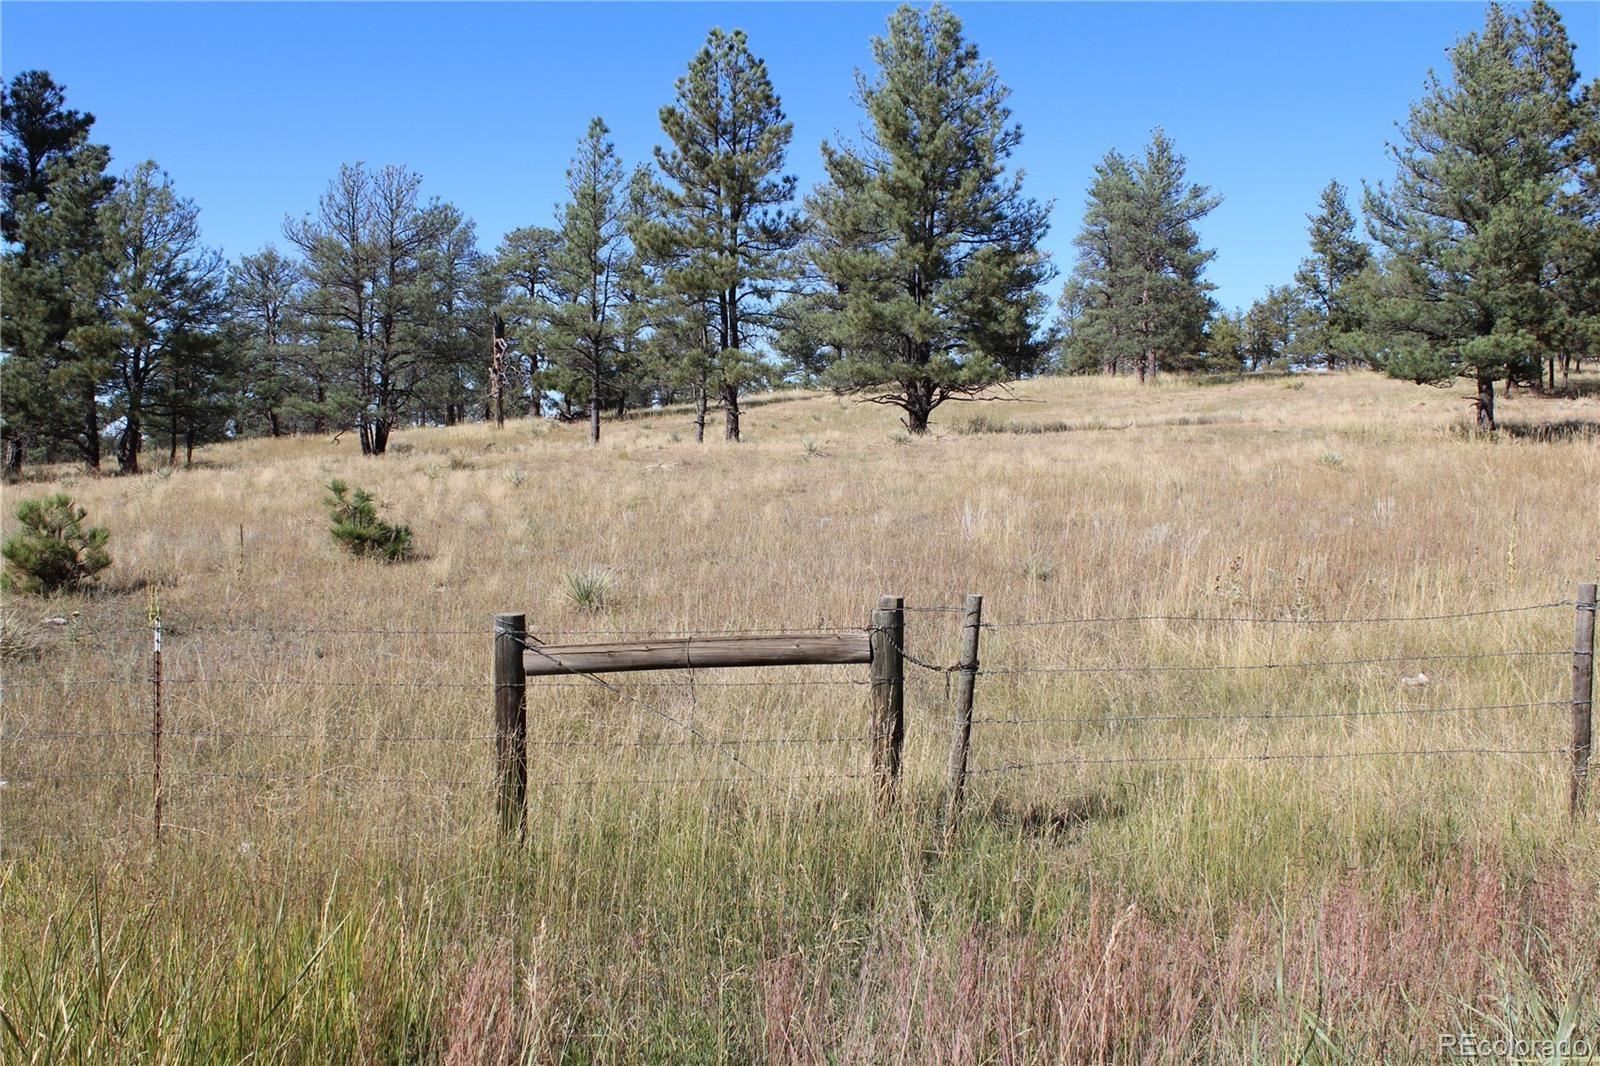 MLS# 2877174 - 1 - Cattle Circle, Kiowa, CO 80117